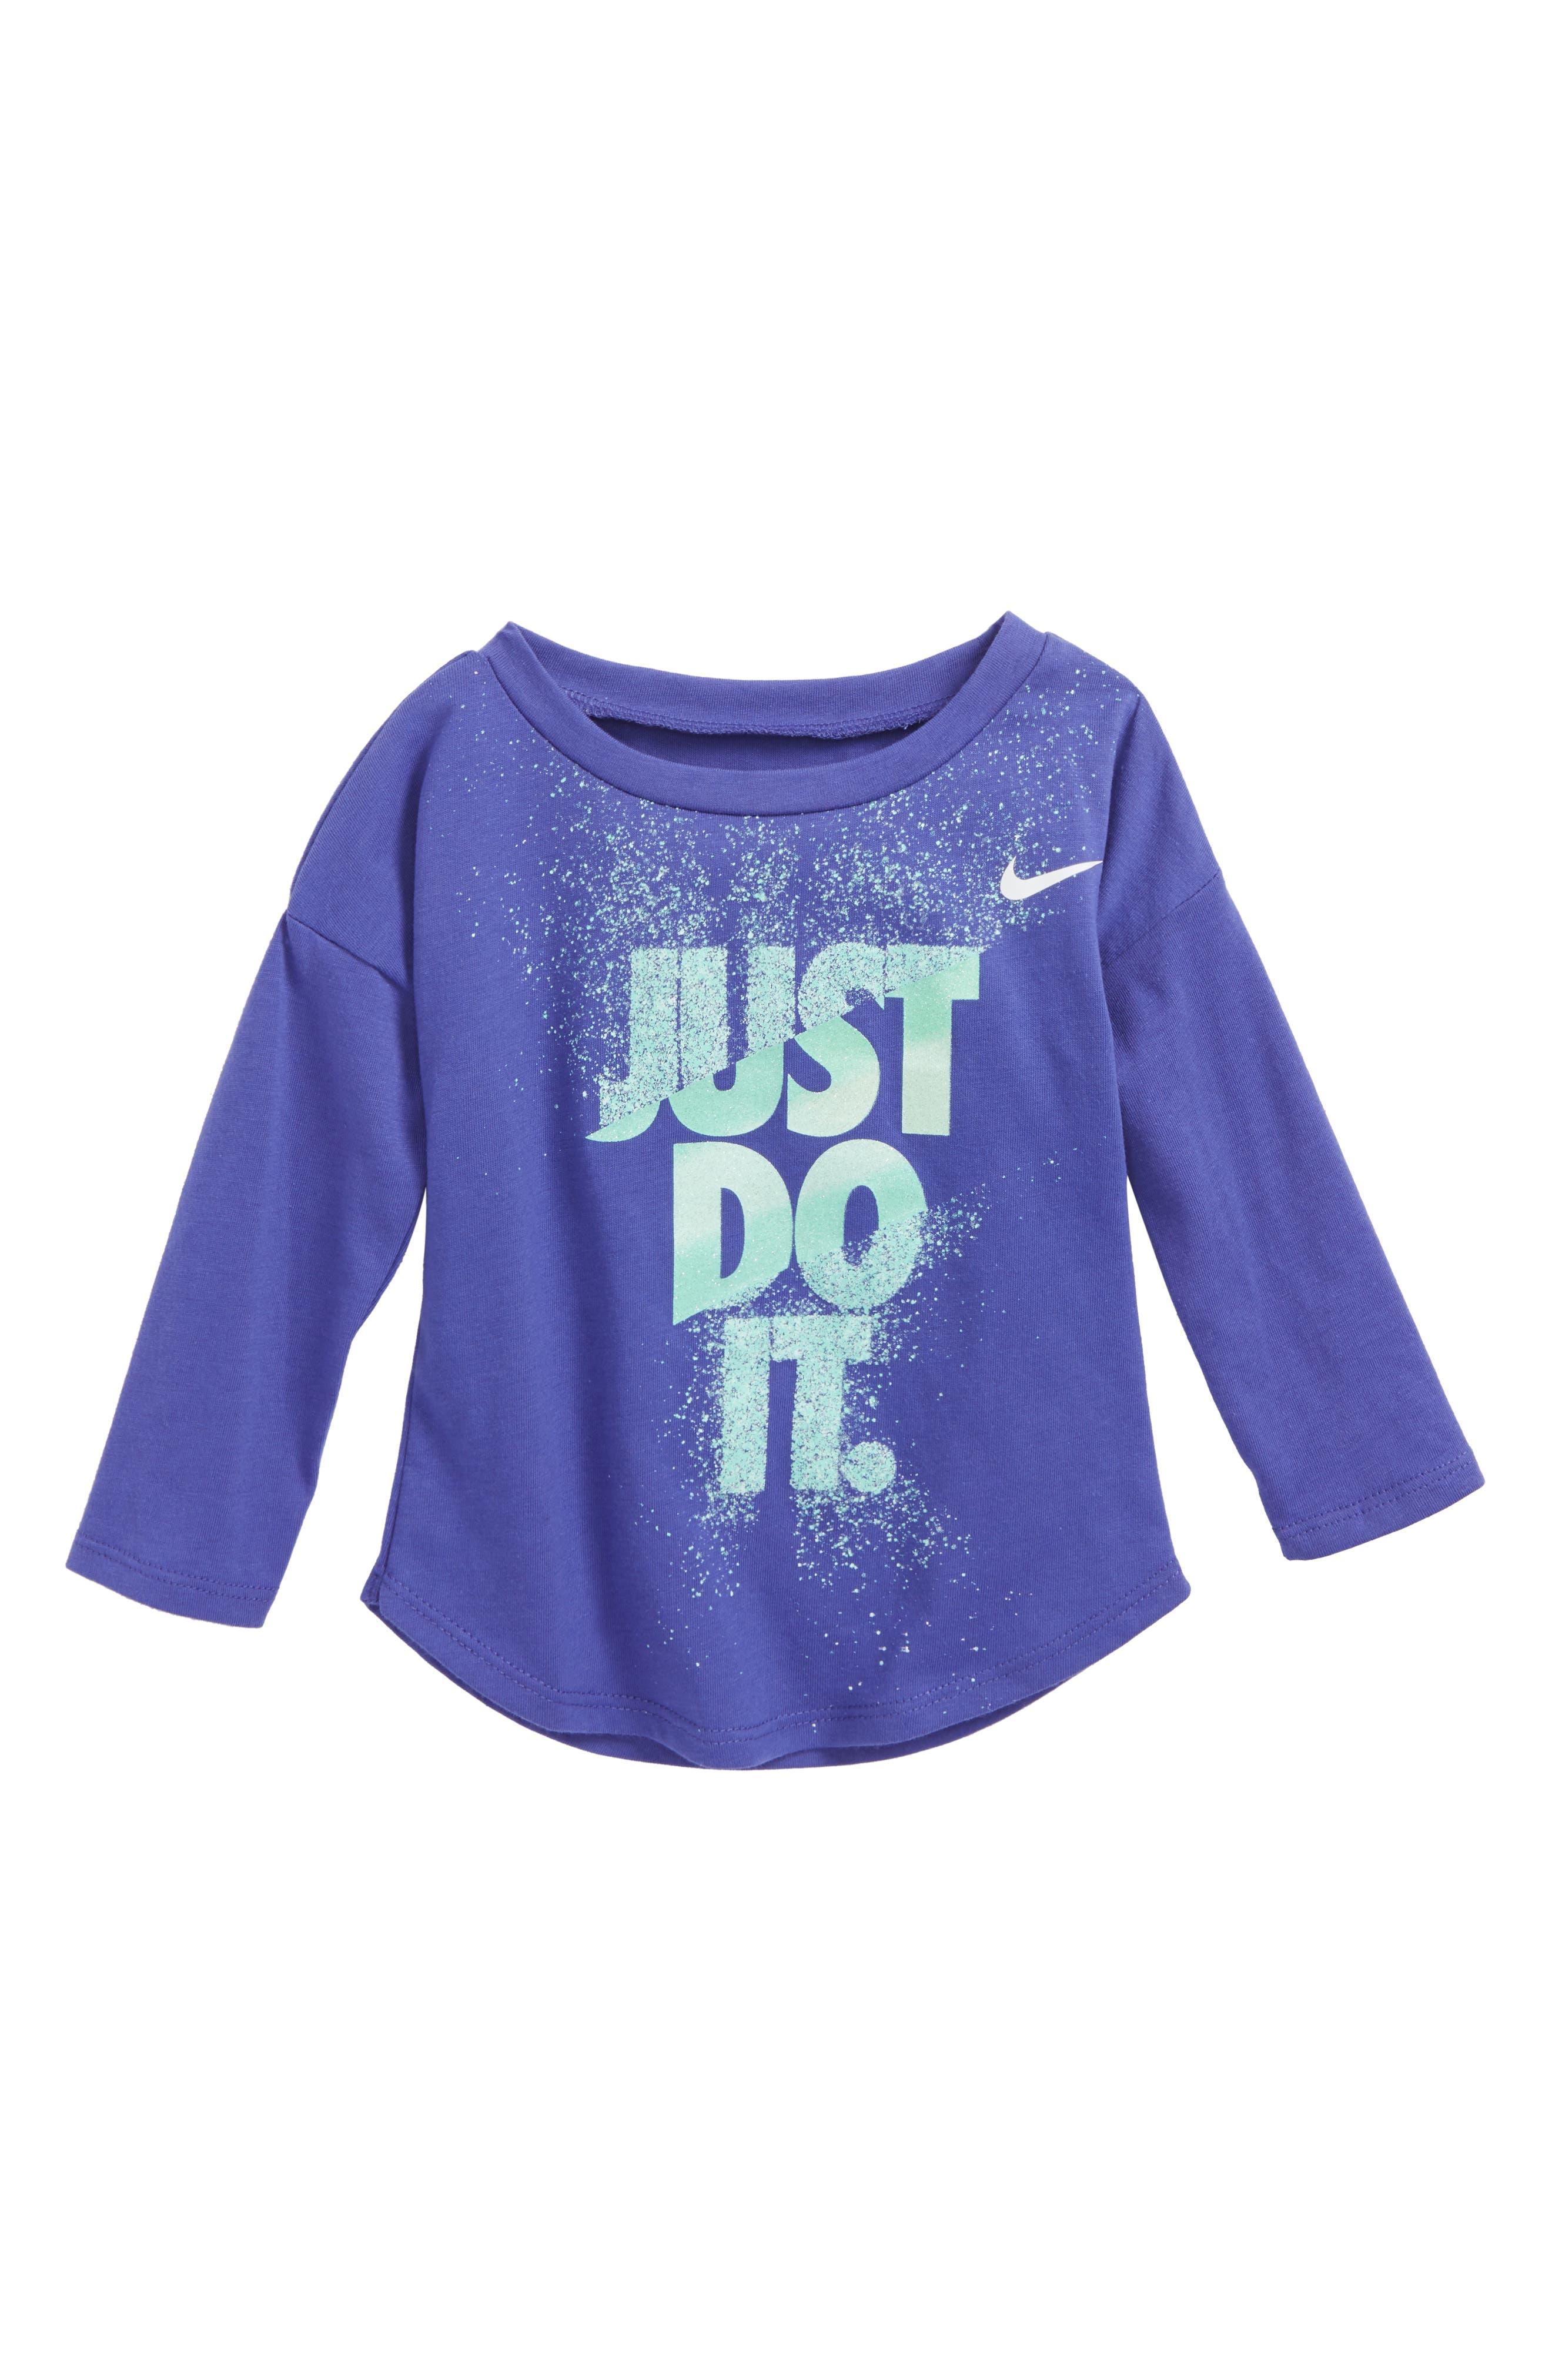 Just Do It Splice Graphic Tee,                         Main,                         color, Purple Comet